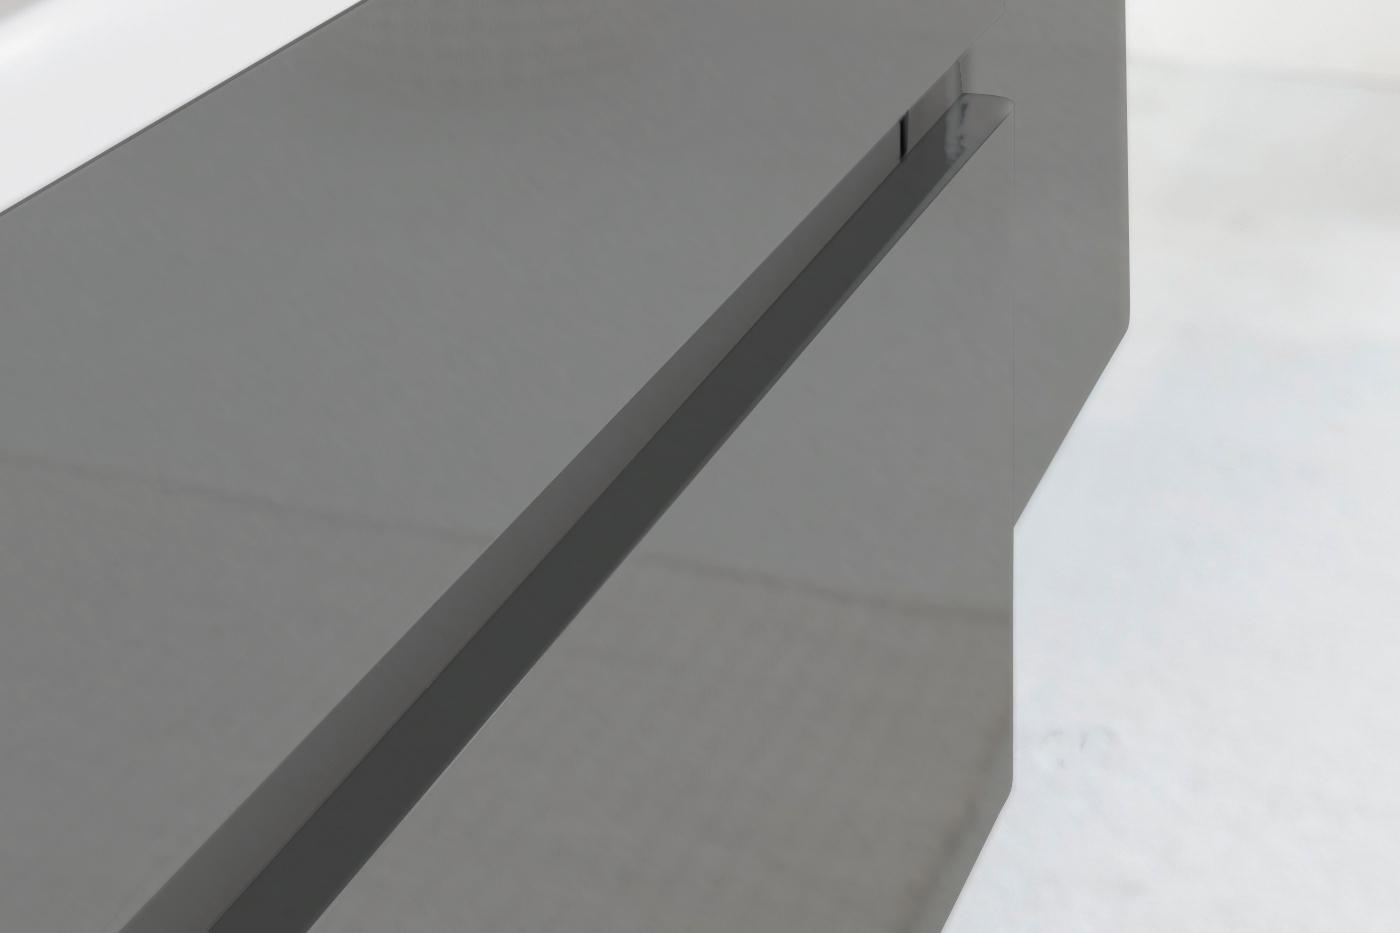 sam badezimmerm bel parma 4tlg grau hochglanz 80 cm auf lager. Black Bedroom Furniture Sets. Home Design Ideas